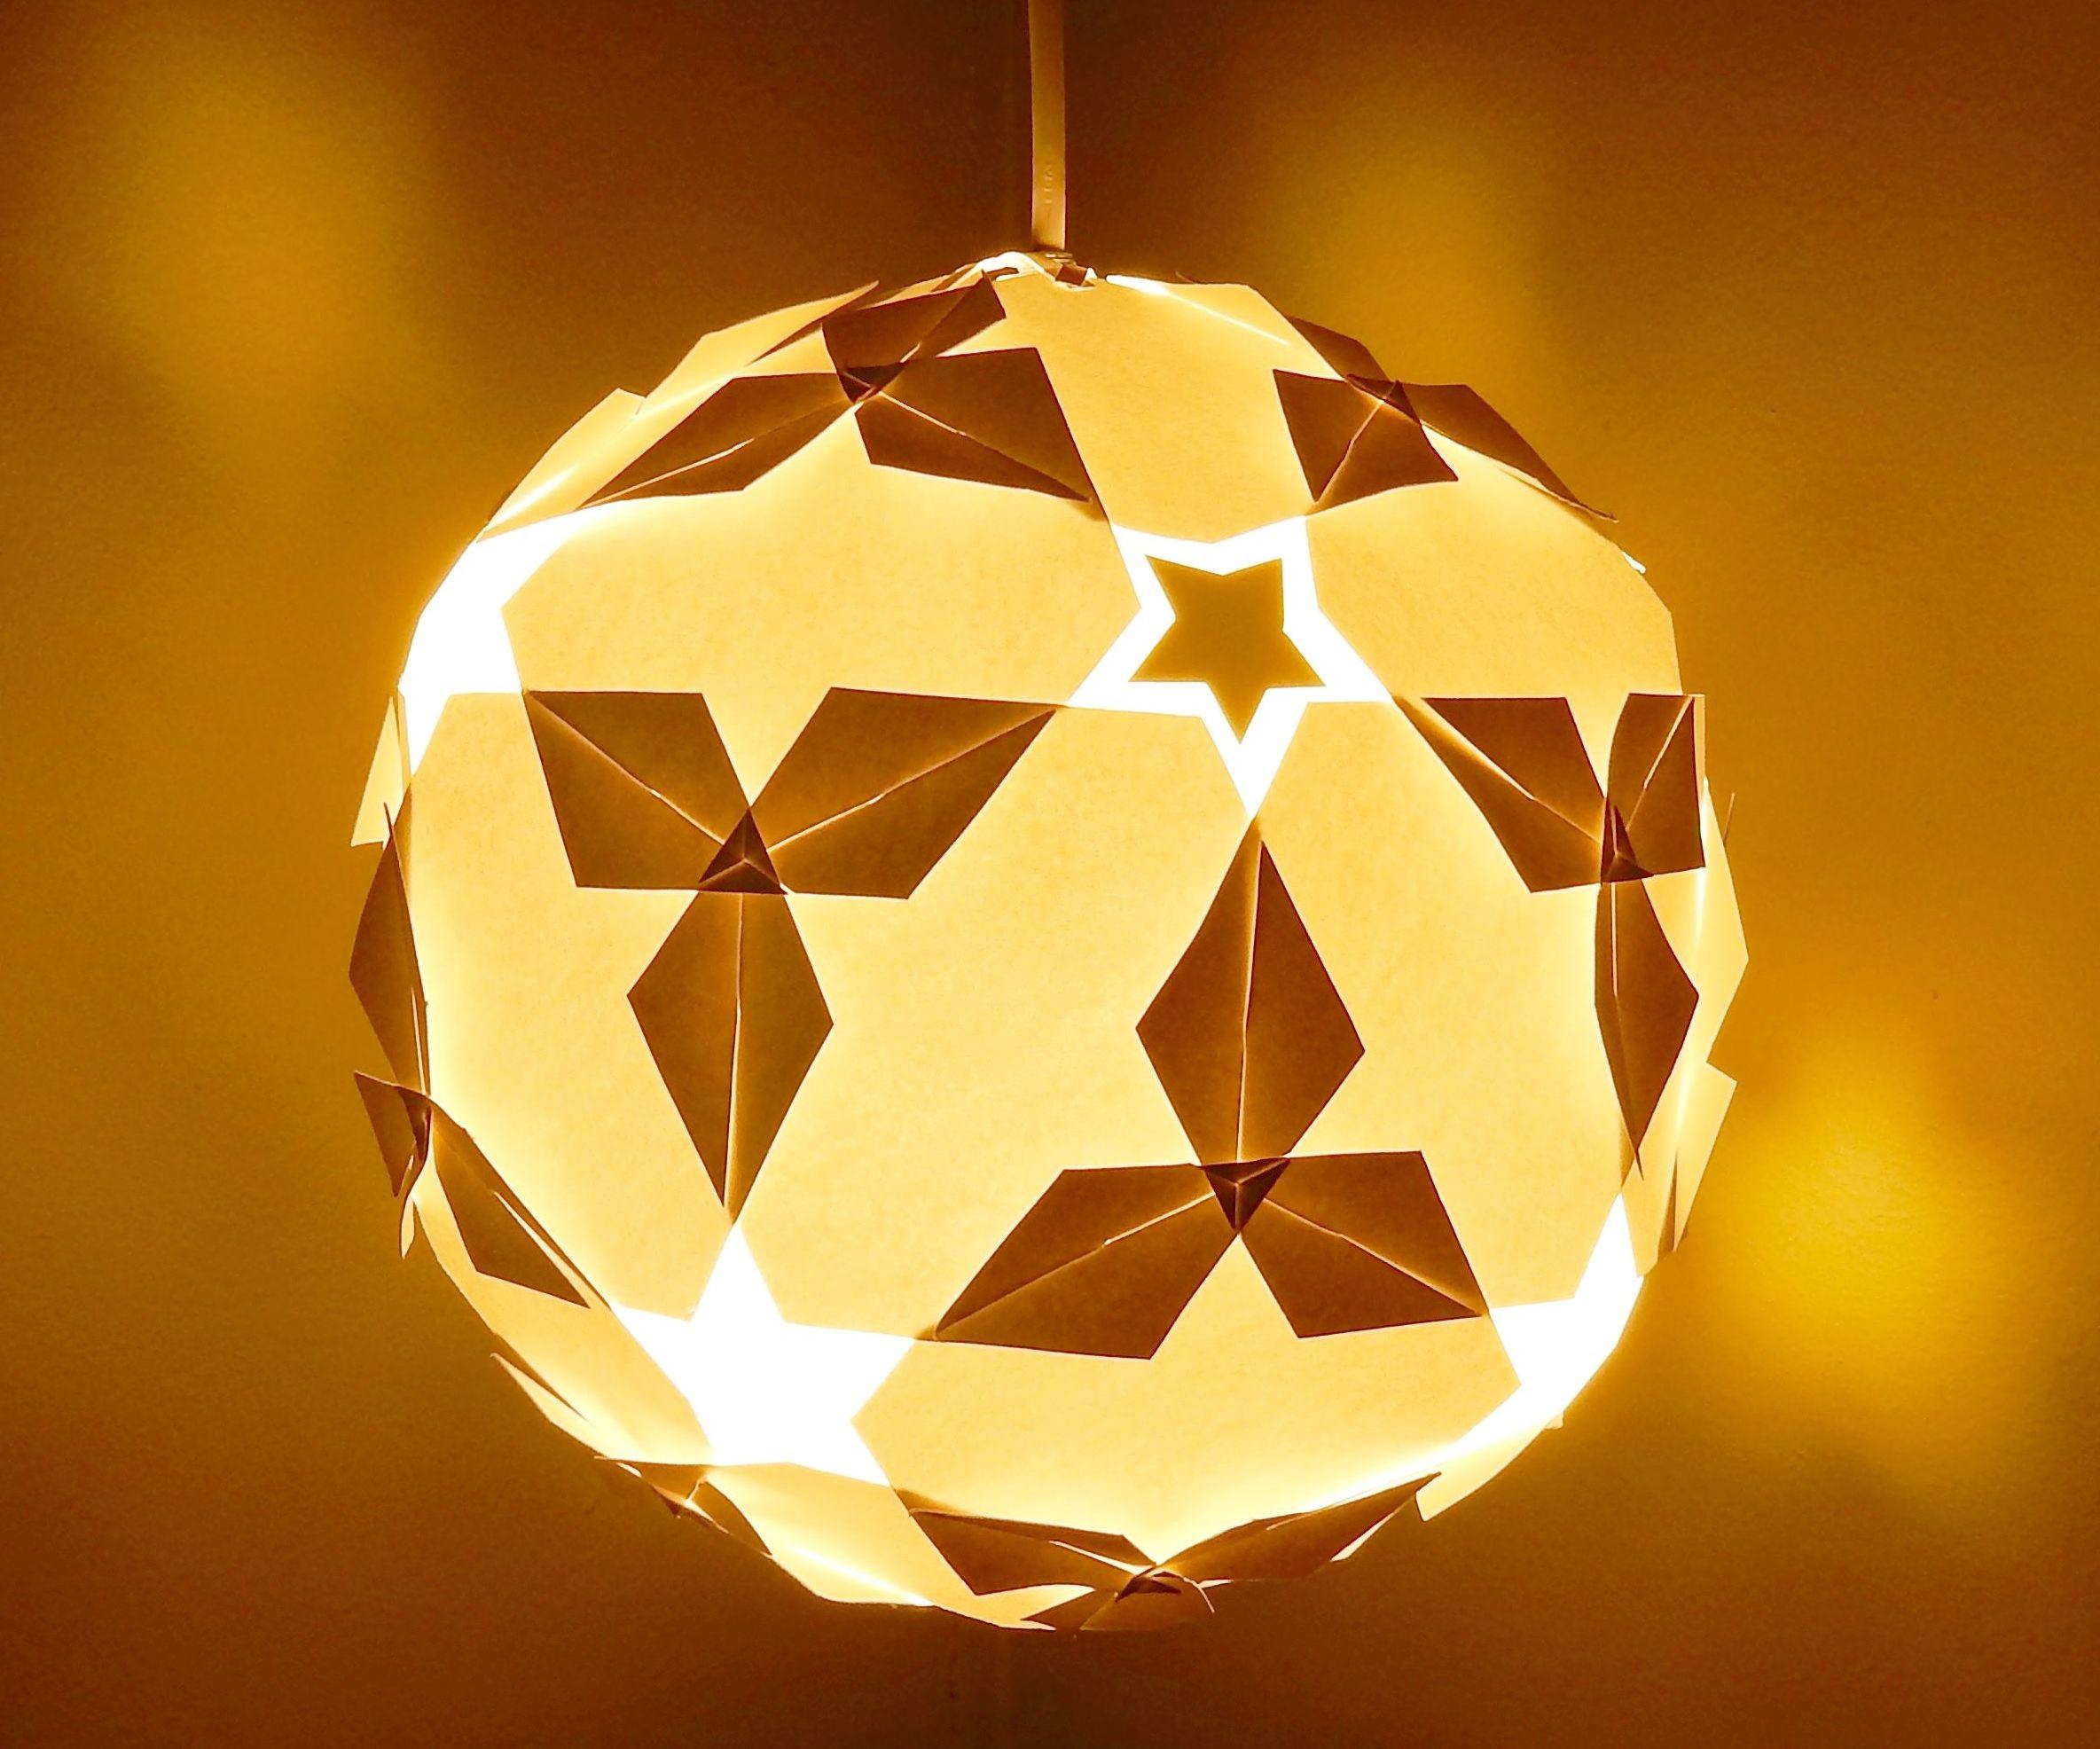 DIY lamp/lantern (star ball)